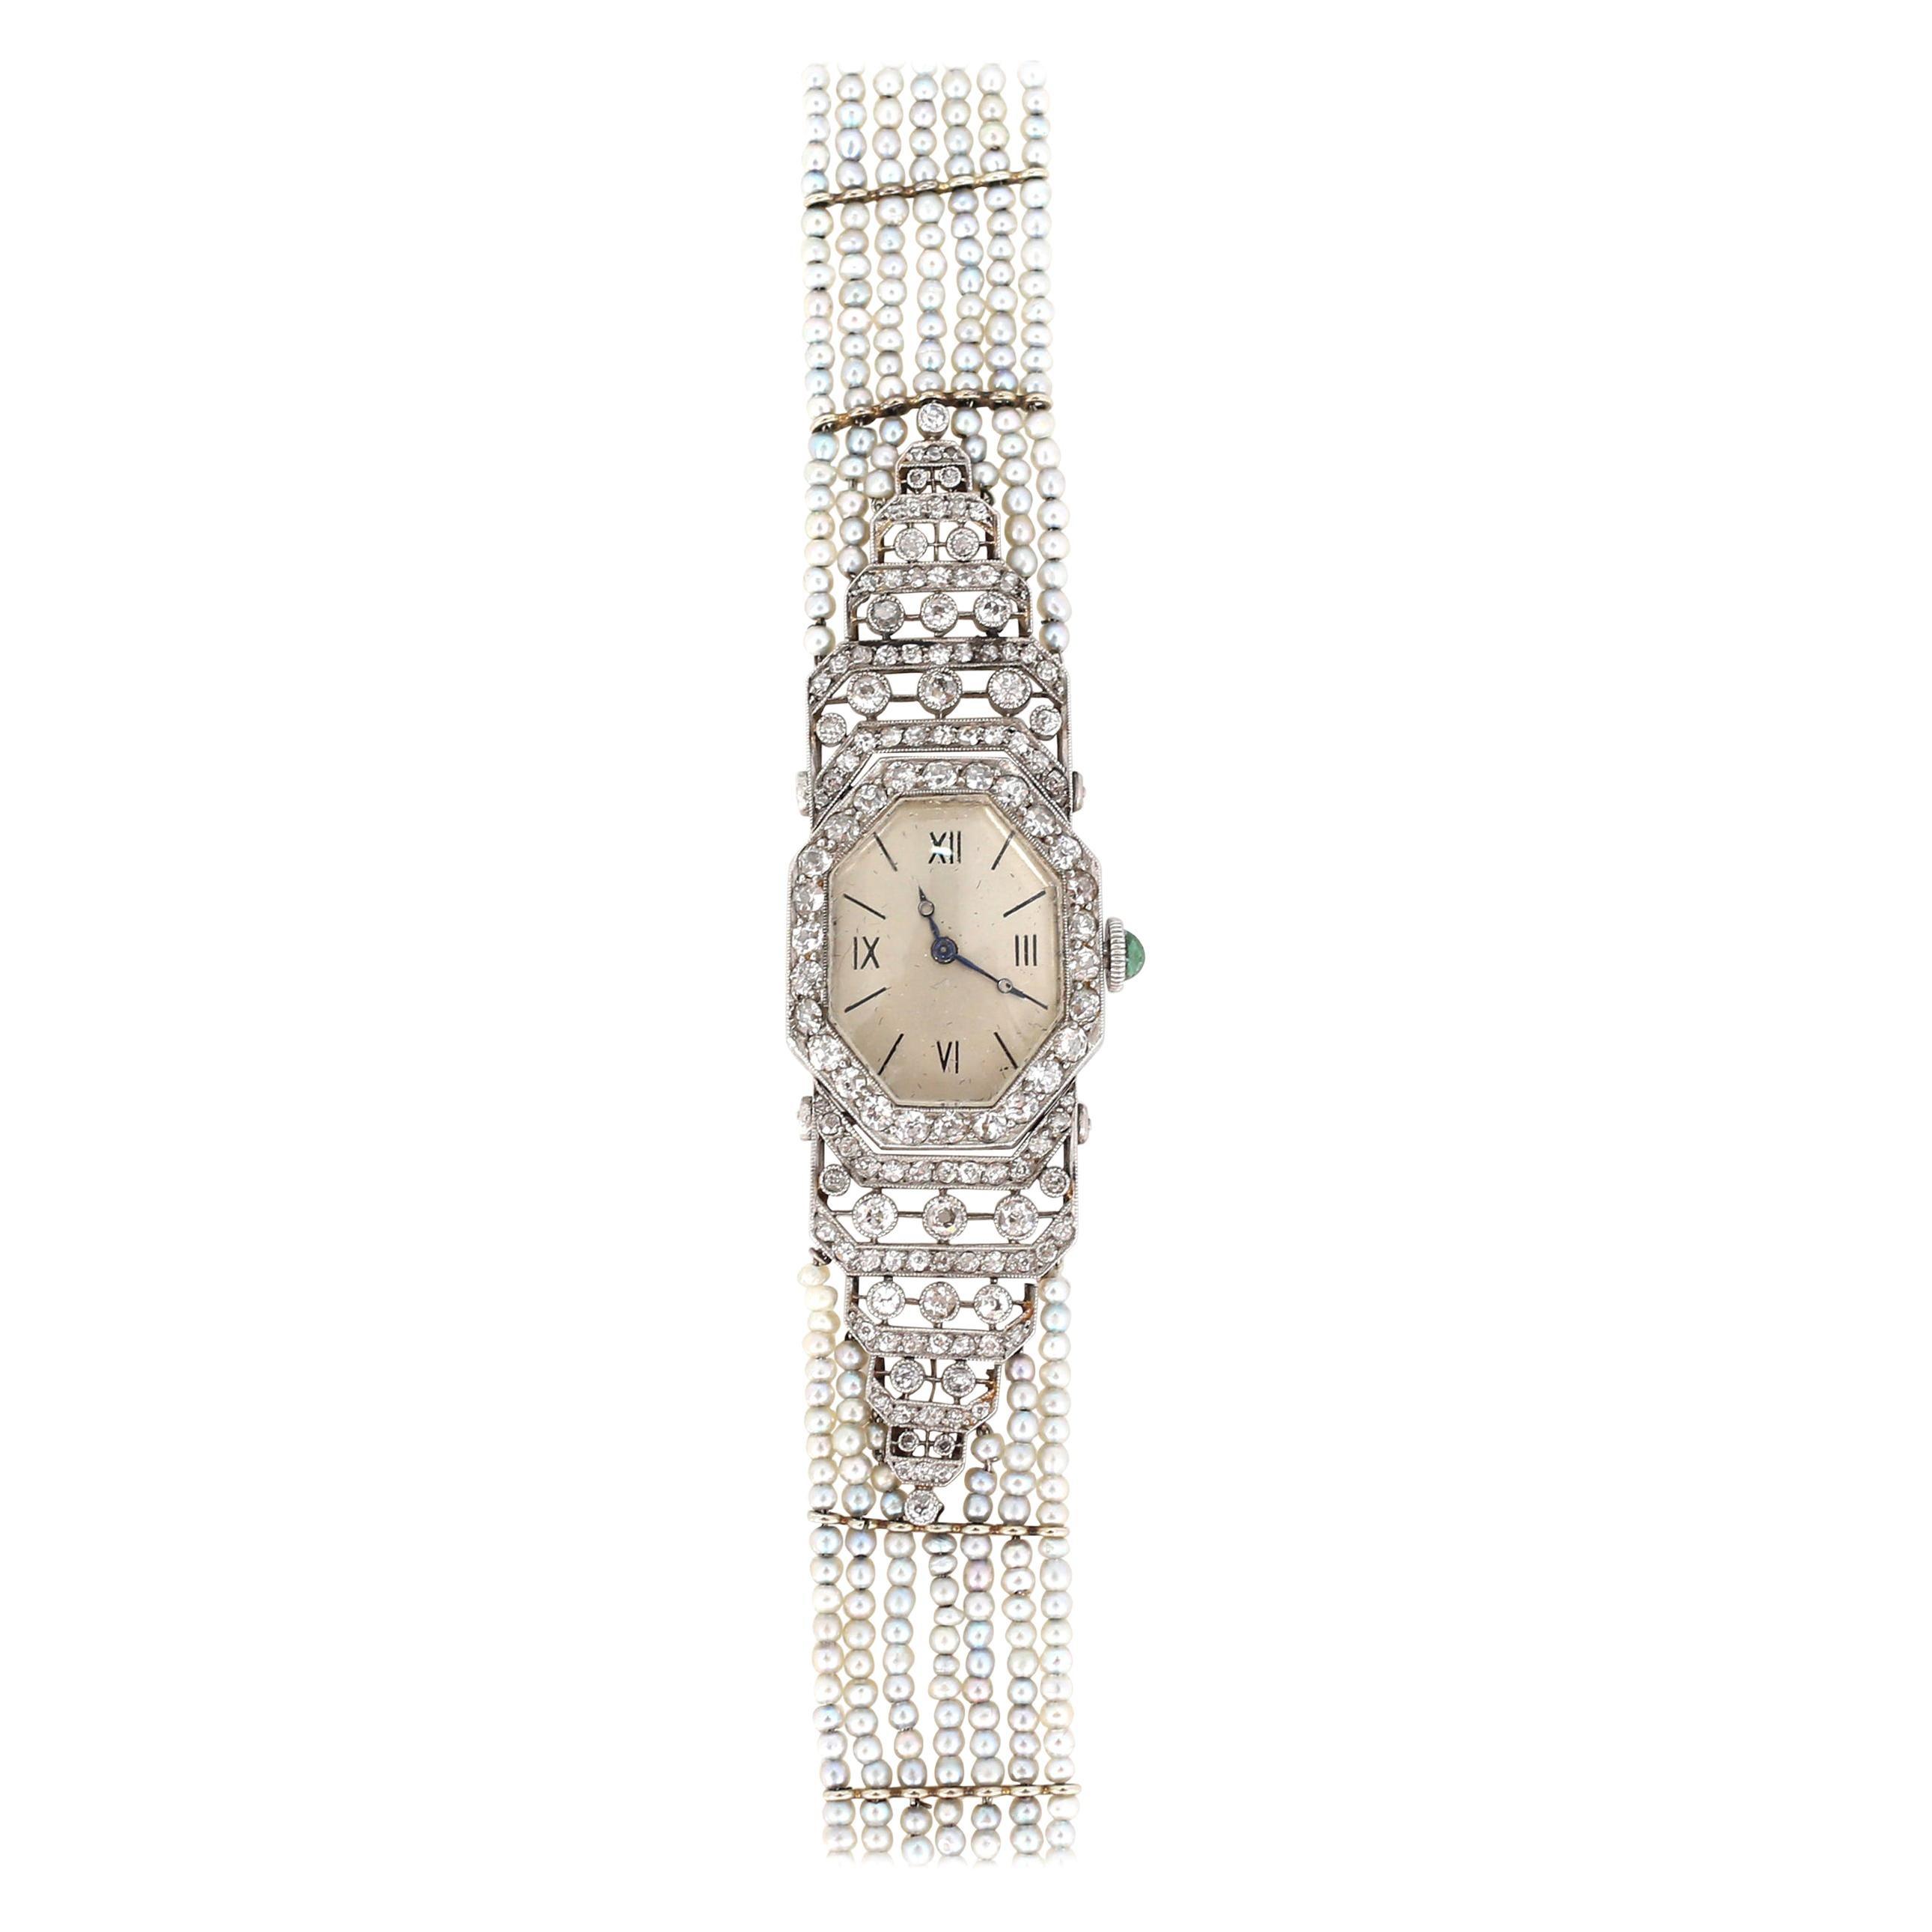 Platinum Pearls Emerald Enamel Diamonds Ladies Watch Art Nouveau, 1930